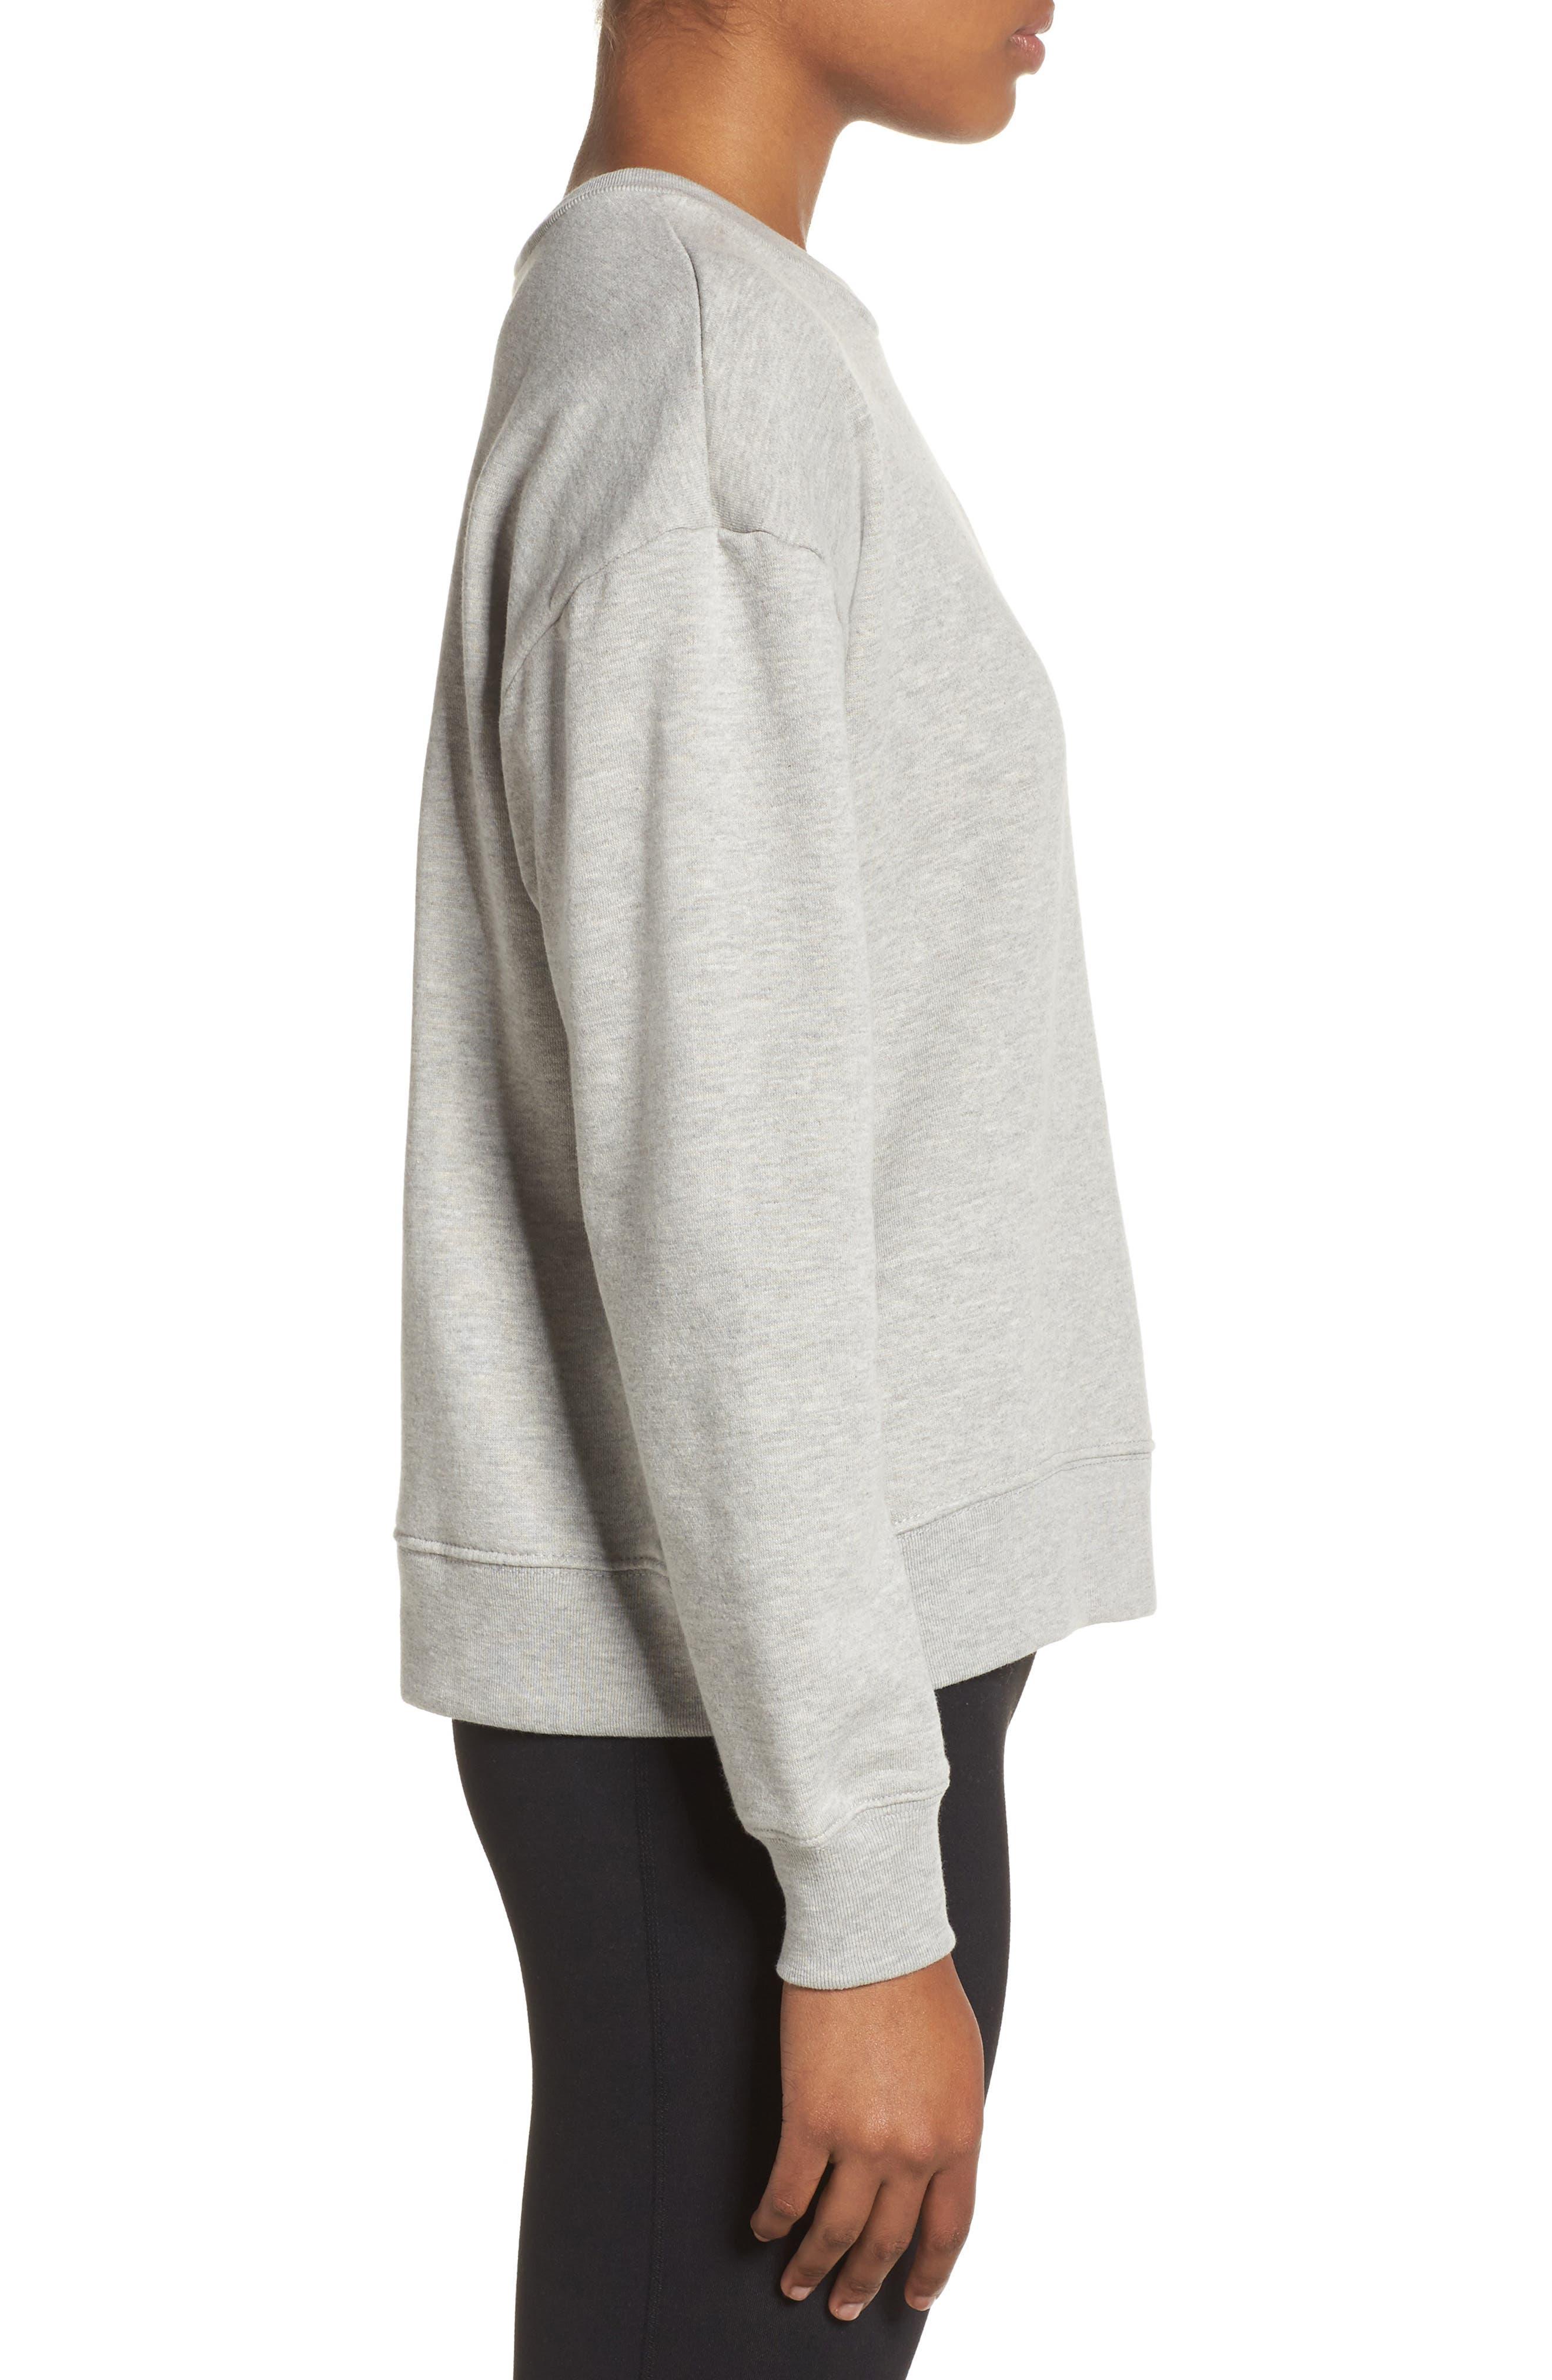 Lace-Up Crewneck Sweatshirt,                             Alternate thumbnail 3, color,                             Grey Heather